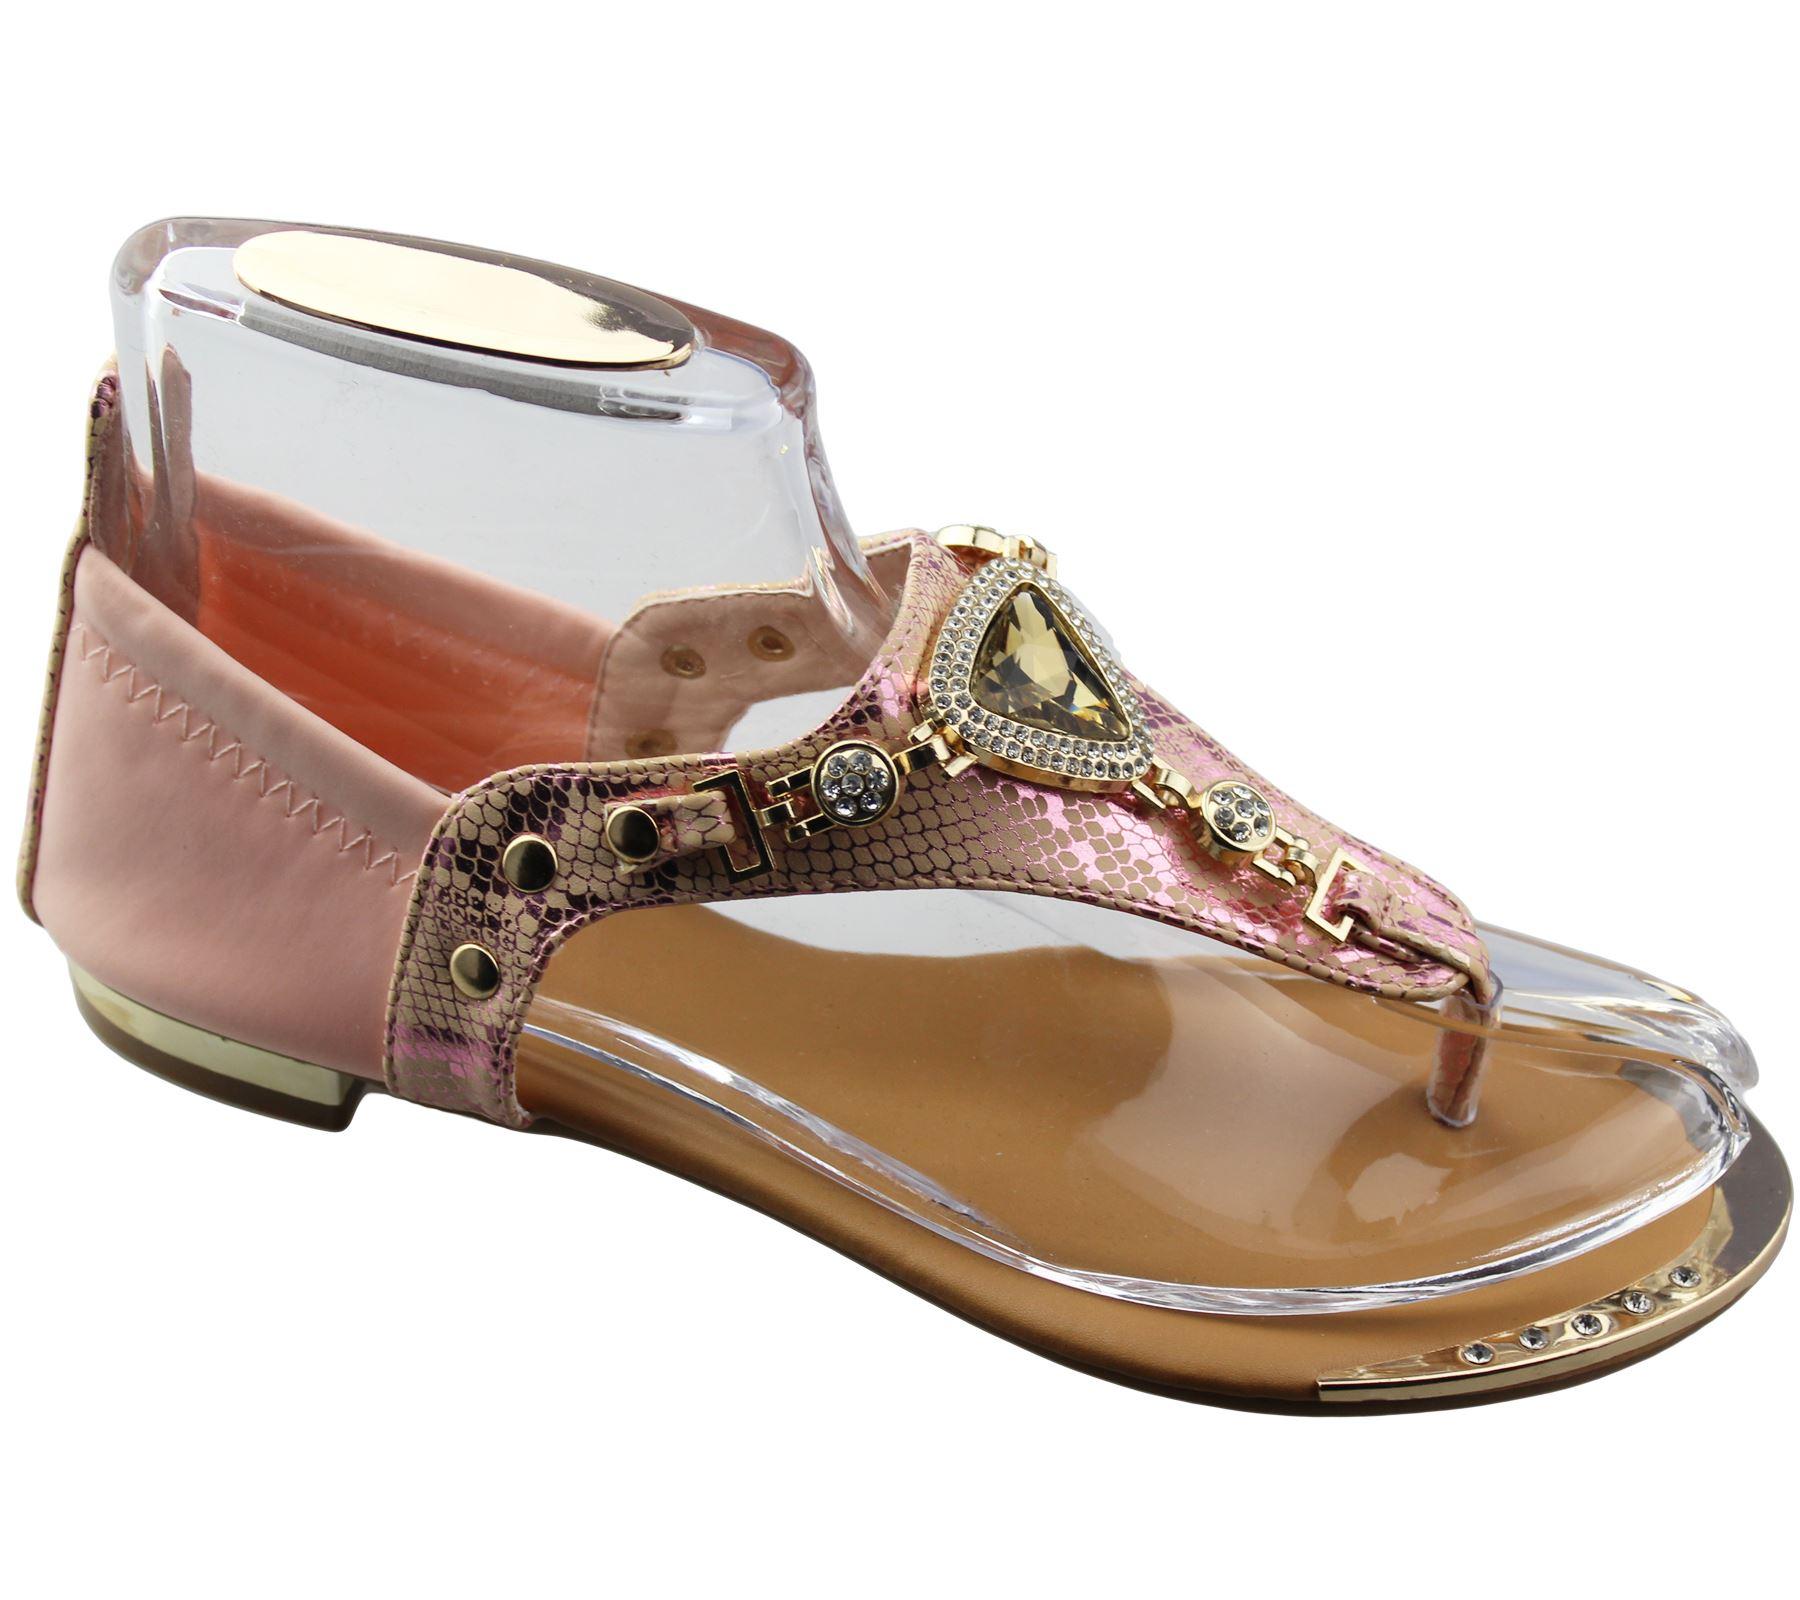 Womens-Flat-Summer-Sandals-Ladies-Diamante-Wedding-Toe-Post-Casual-Slipper thumbnail 30